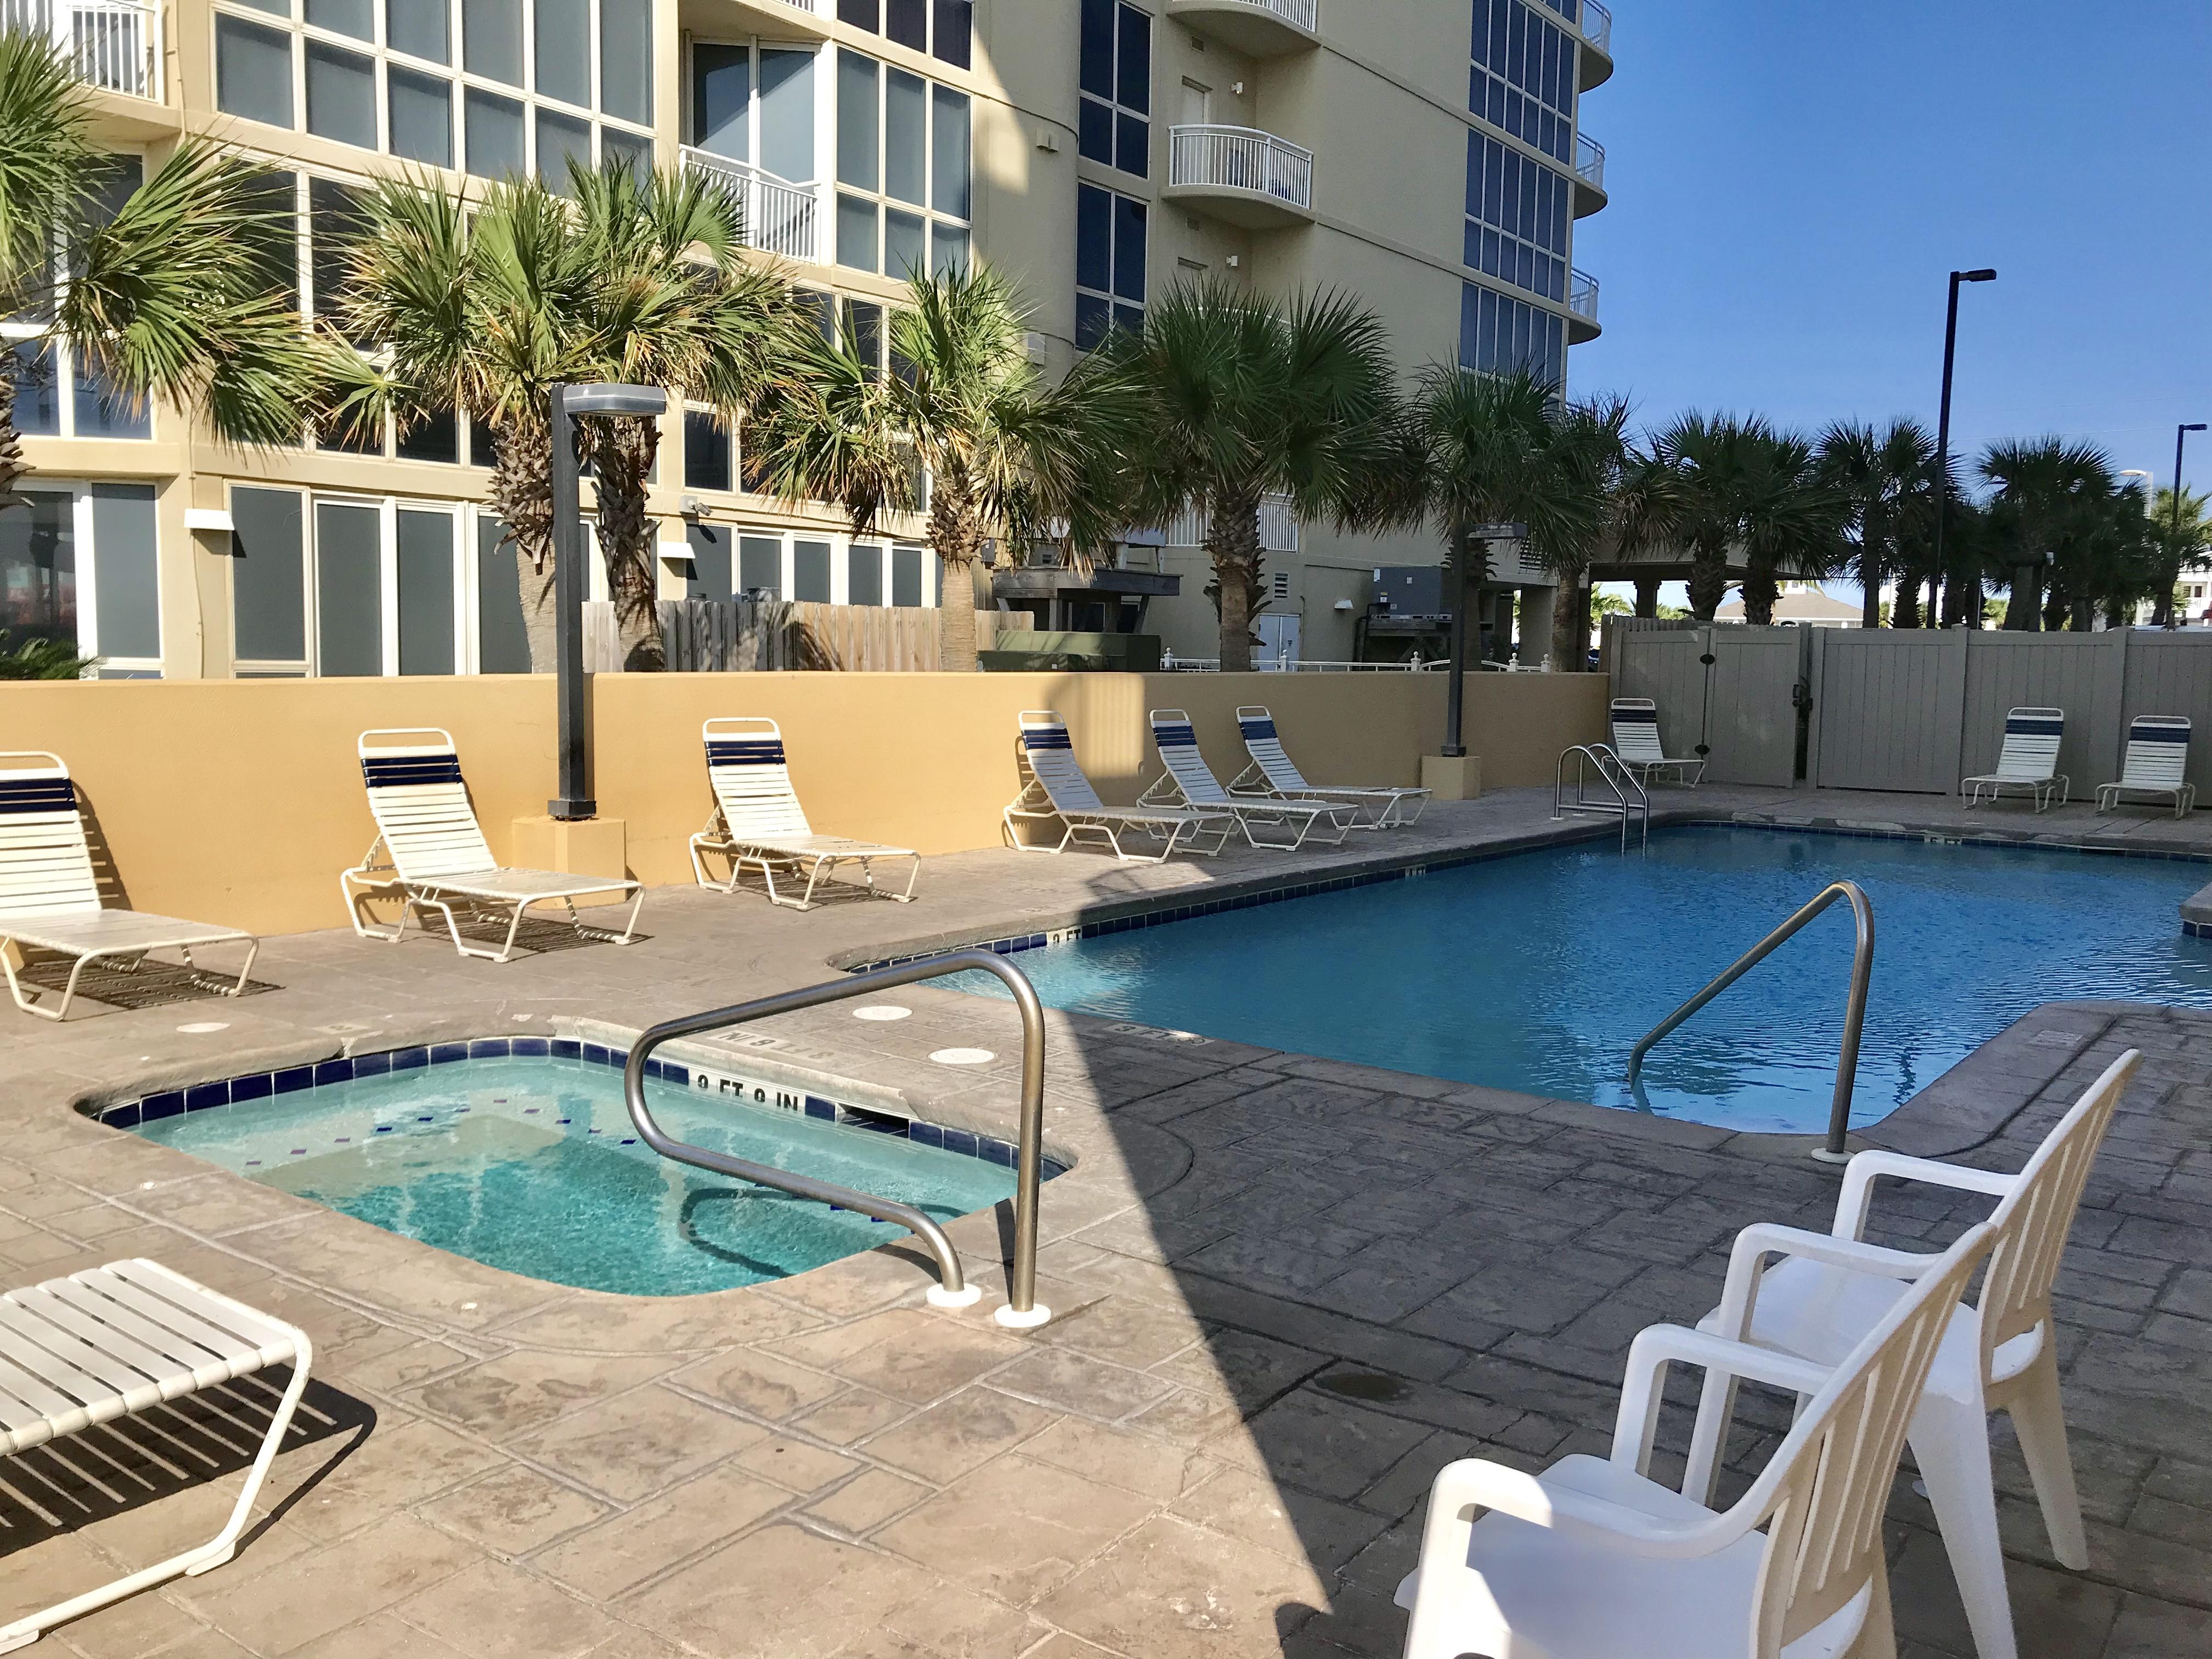 Island Royale 1105 Condo rental in Island Royale in Gulf Shores Alabama - #35